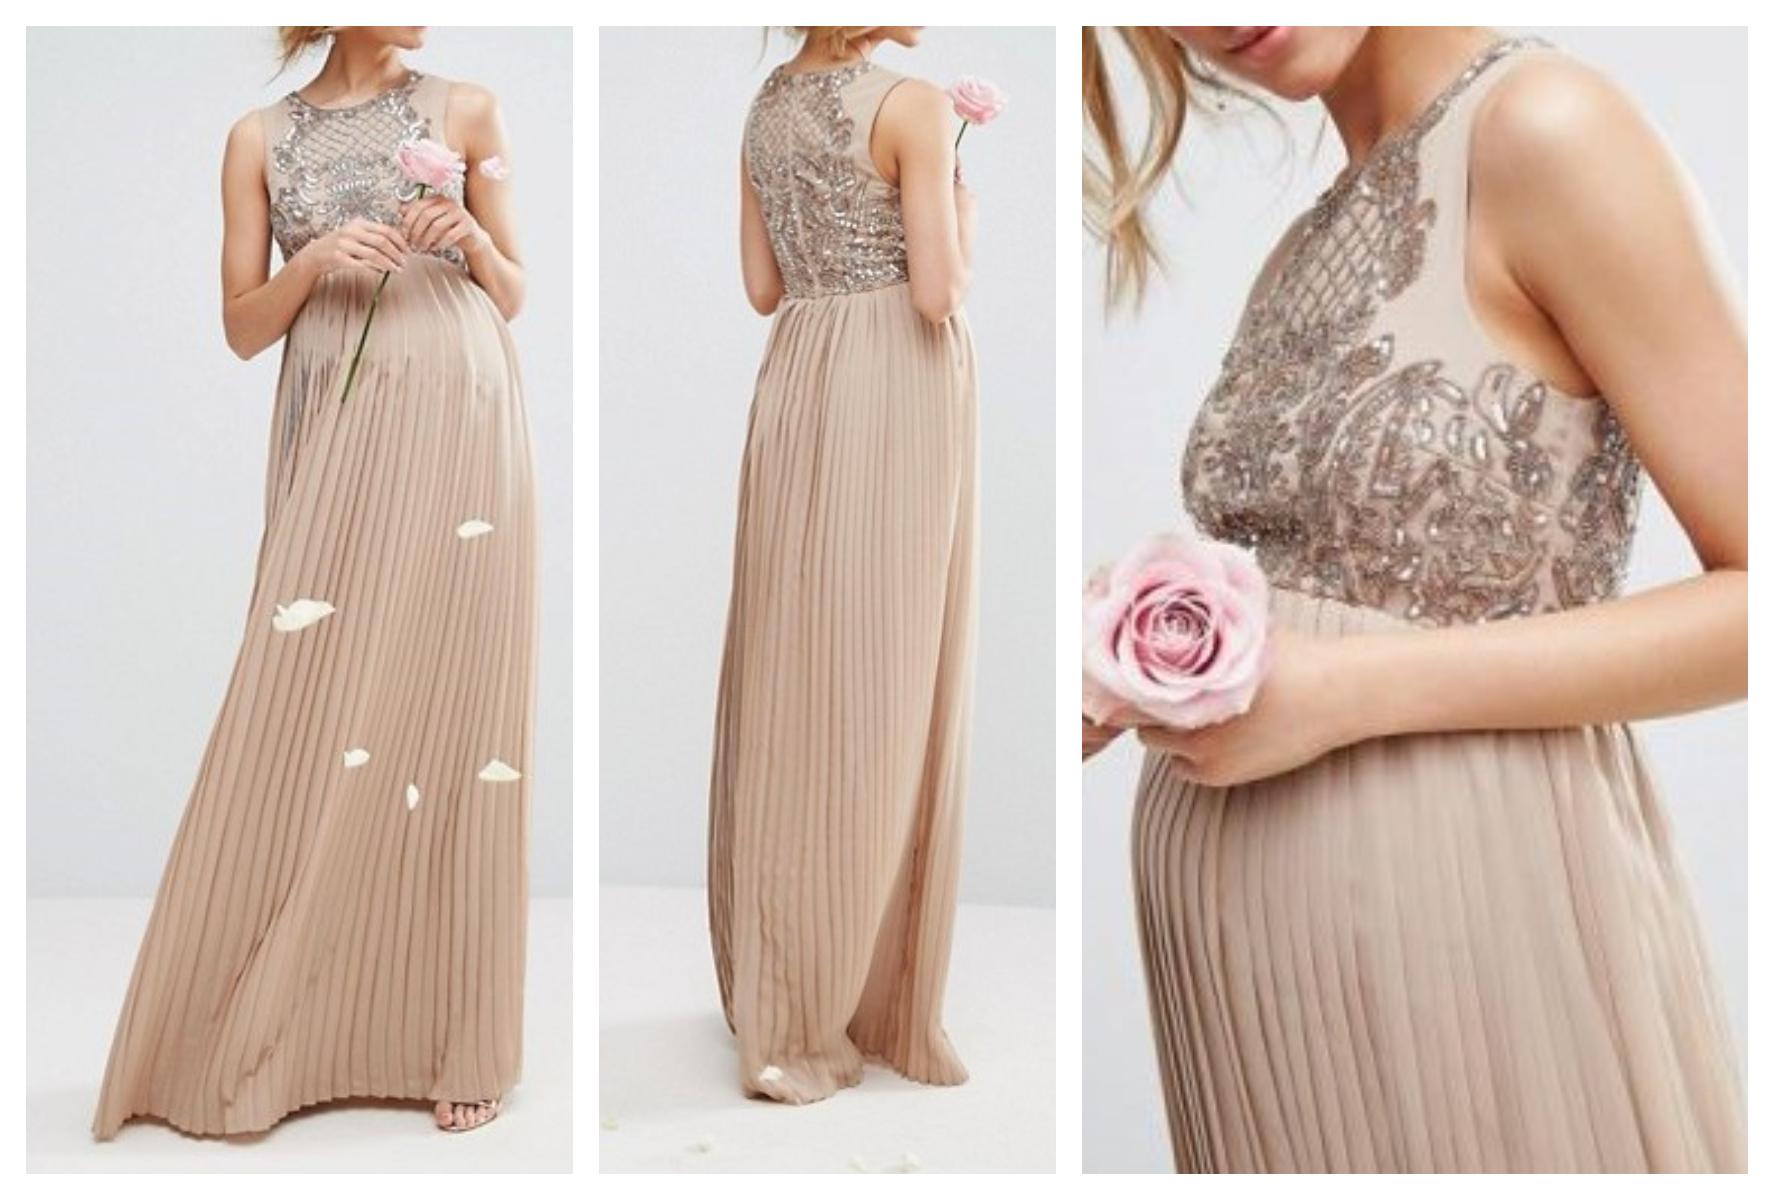 1fe66aea0bbd7f ex44 sukienka ciążowa maternity długa wesele 38 M - 7332824567 ...